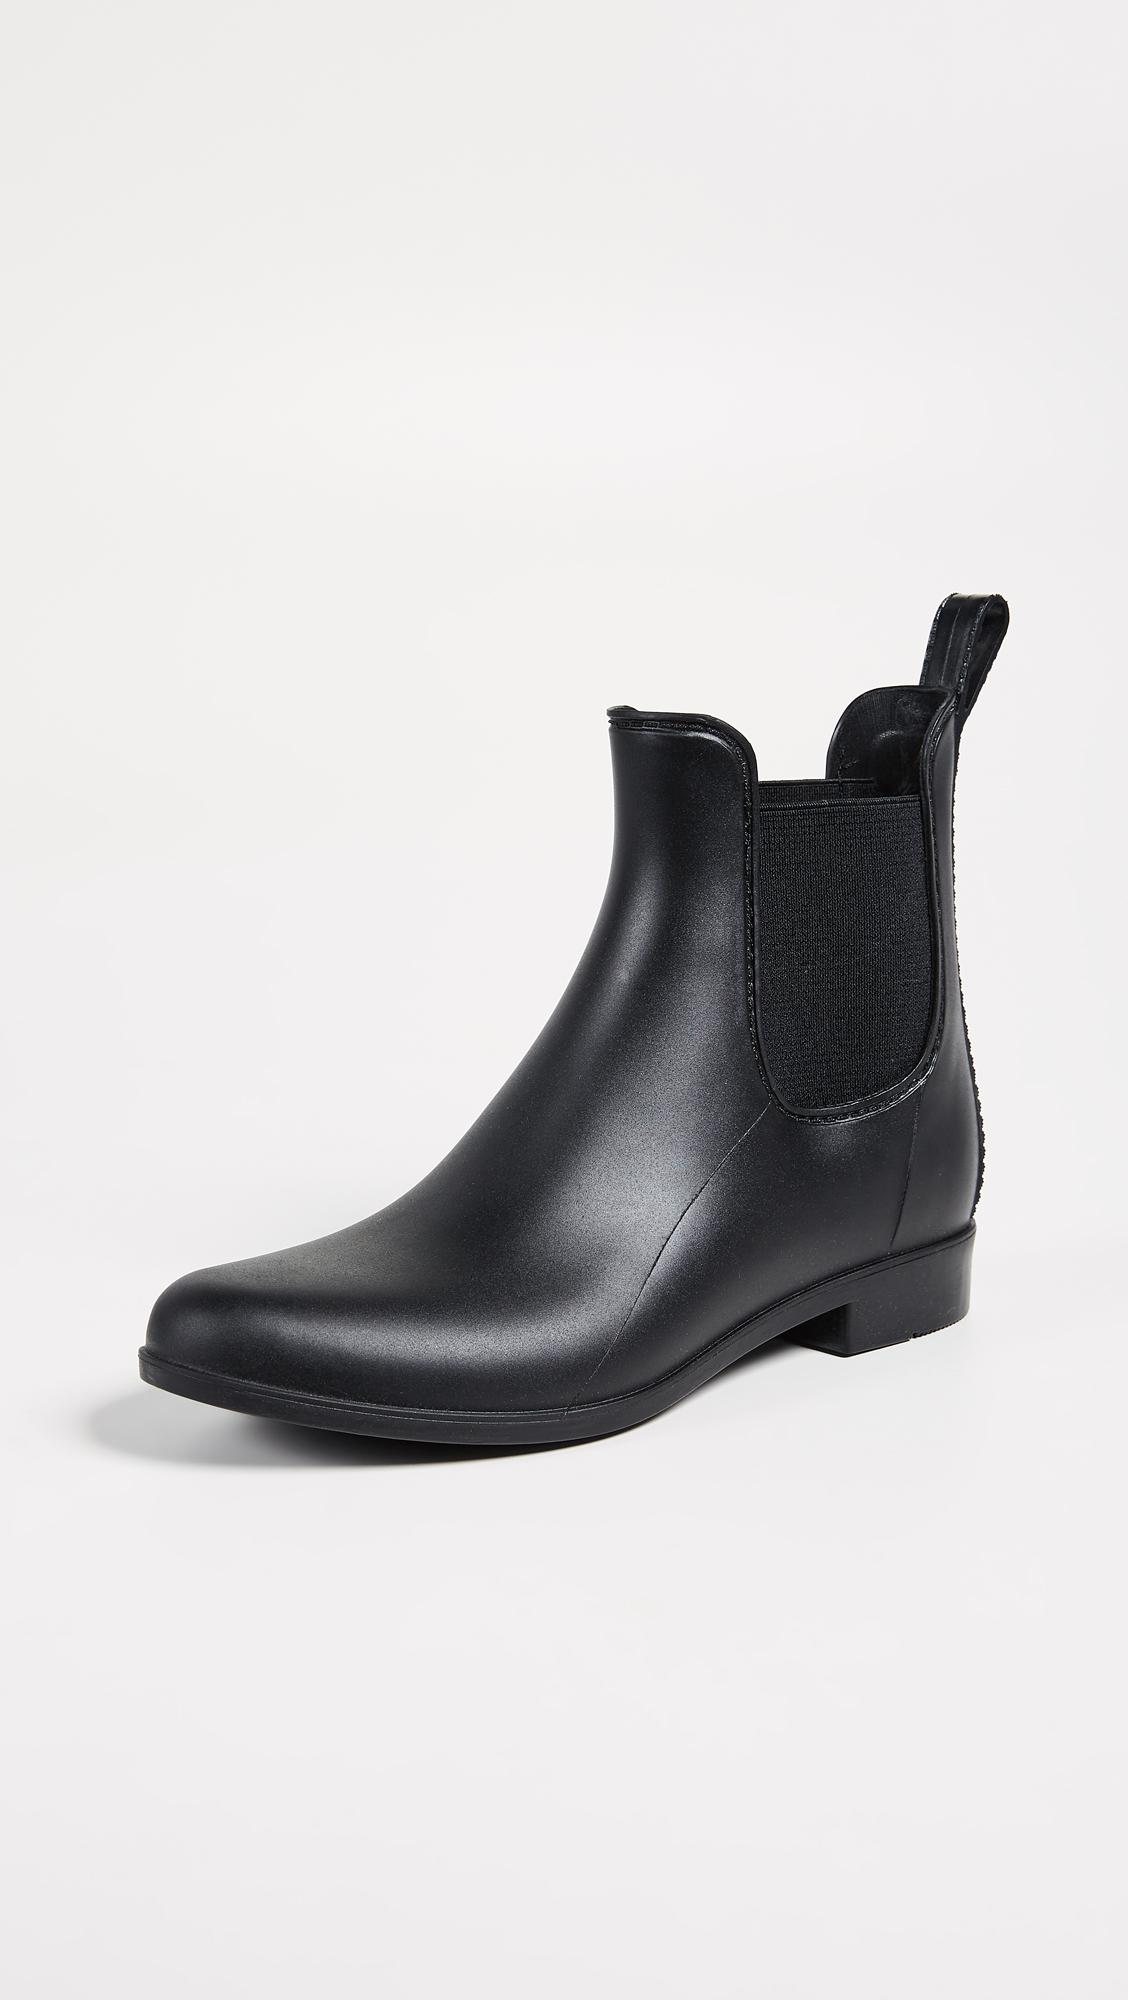 982fb34cbb035 Sam Edelman. Tinsley Chelsea Rain Booties